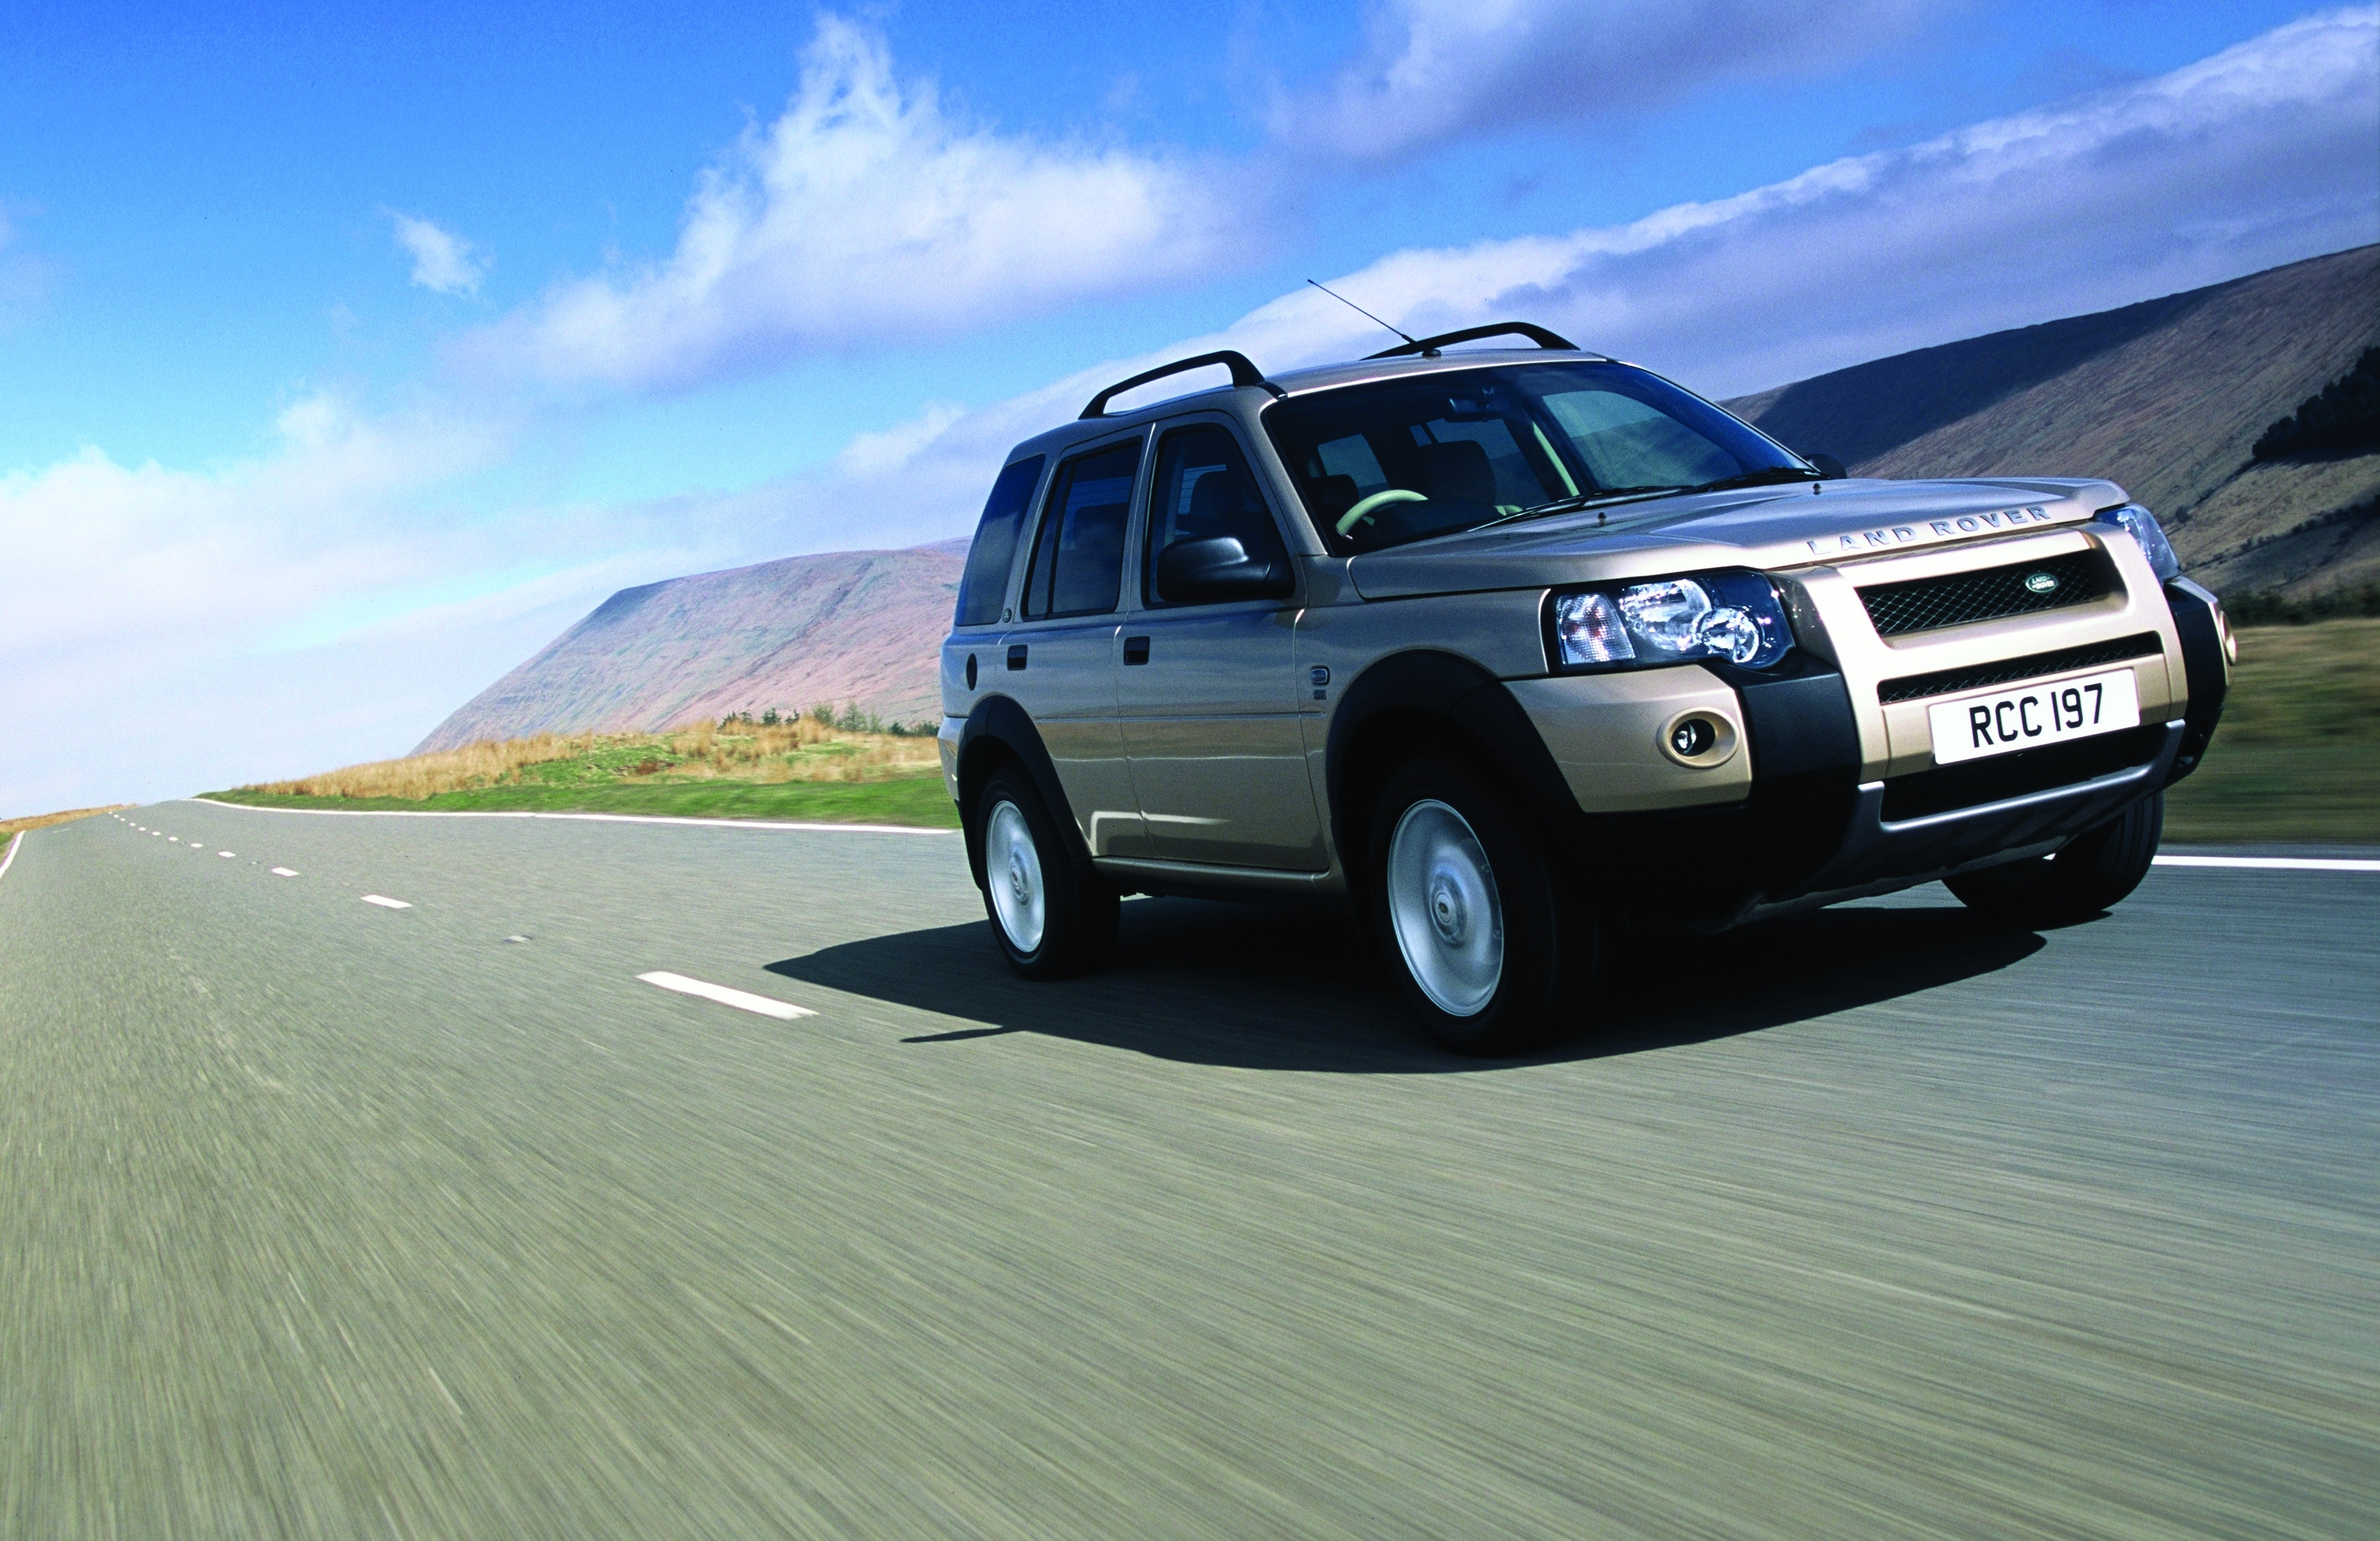 Land Rover Freelander, Land Rover, Freelander, Defender, Land Rover Defender, Land Rover Discovery, Discovery, 4x4, off road, winching, classic car, retro car, car sales, bargain car, cheap car, autotrader, ebay motors, car, cars, motoring, automotive